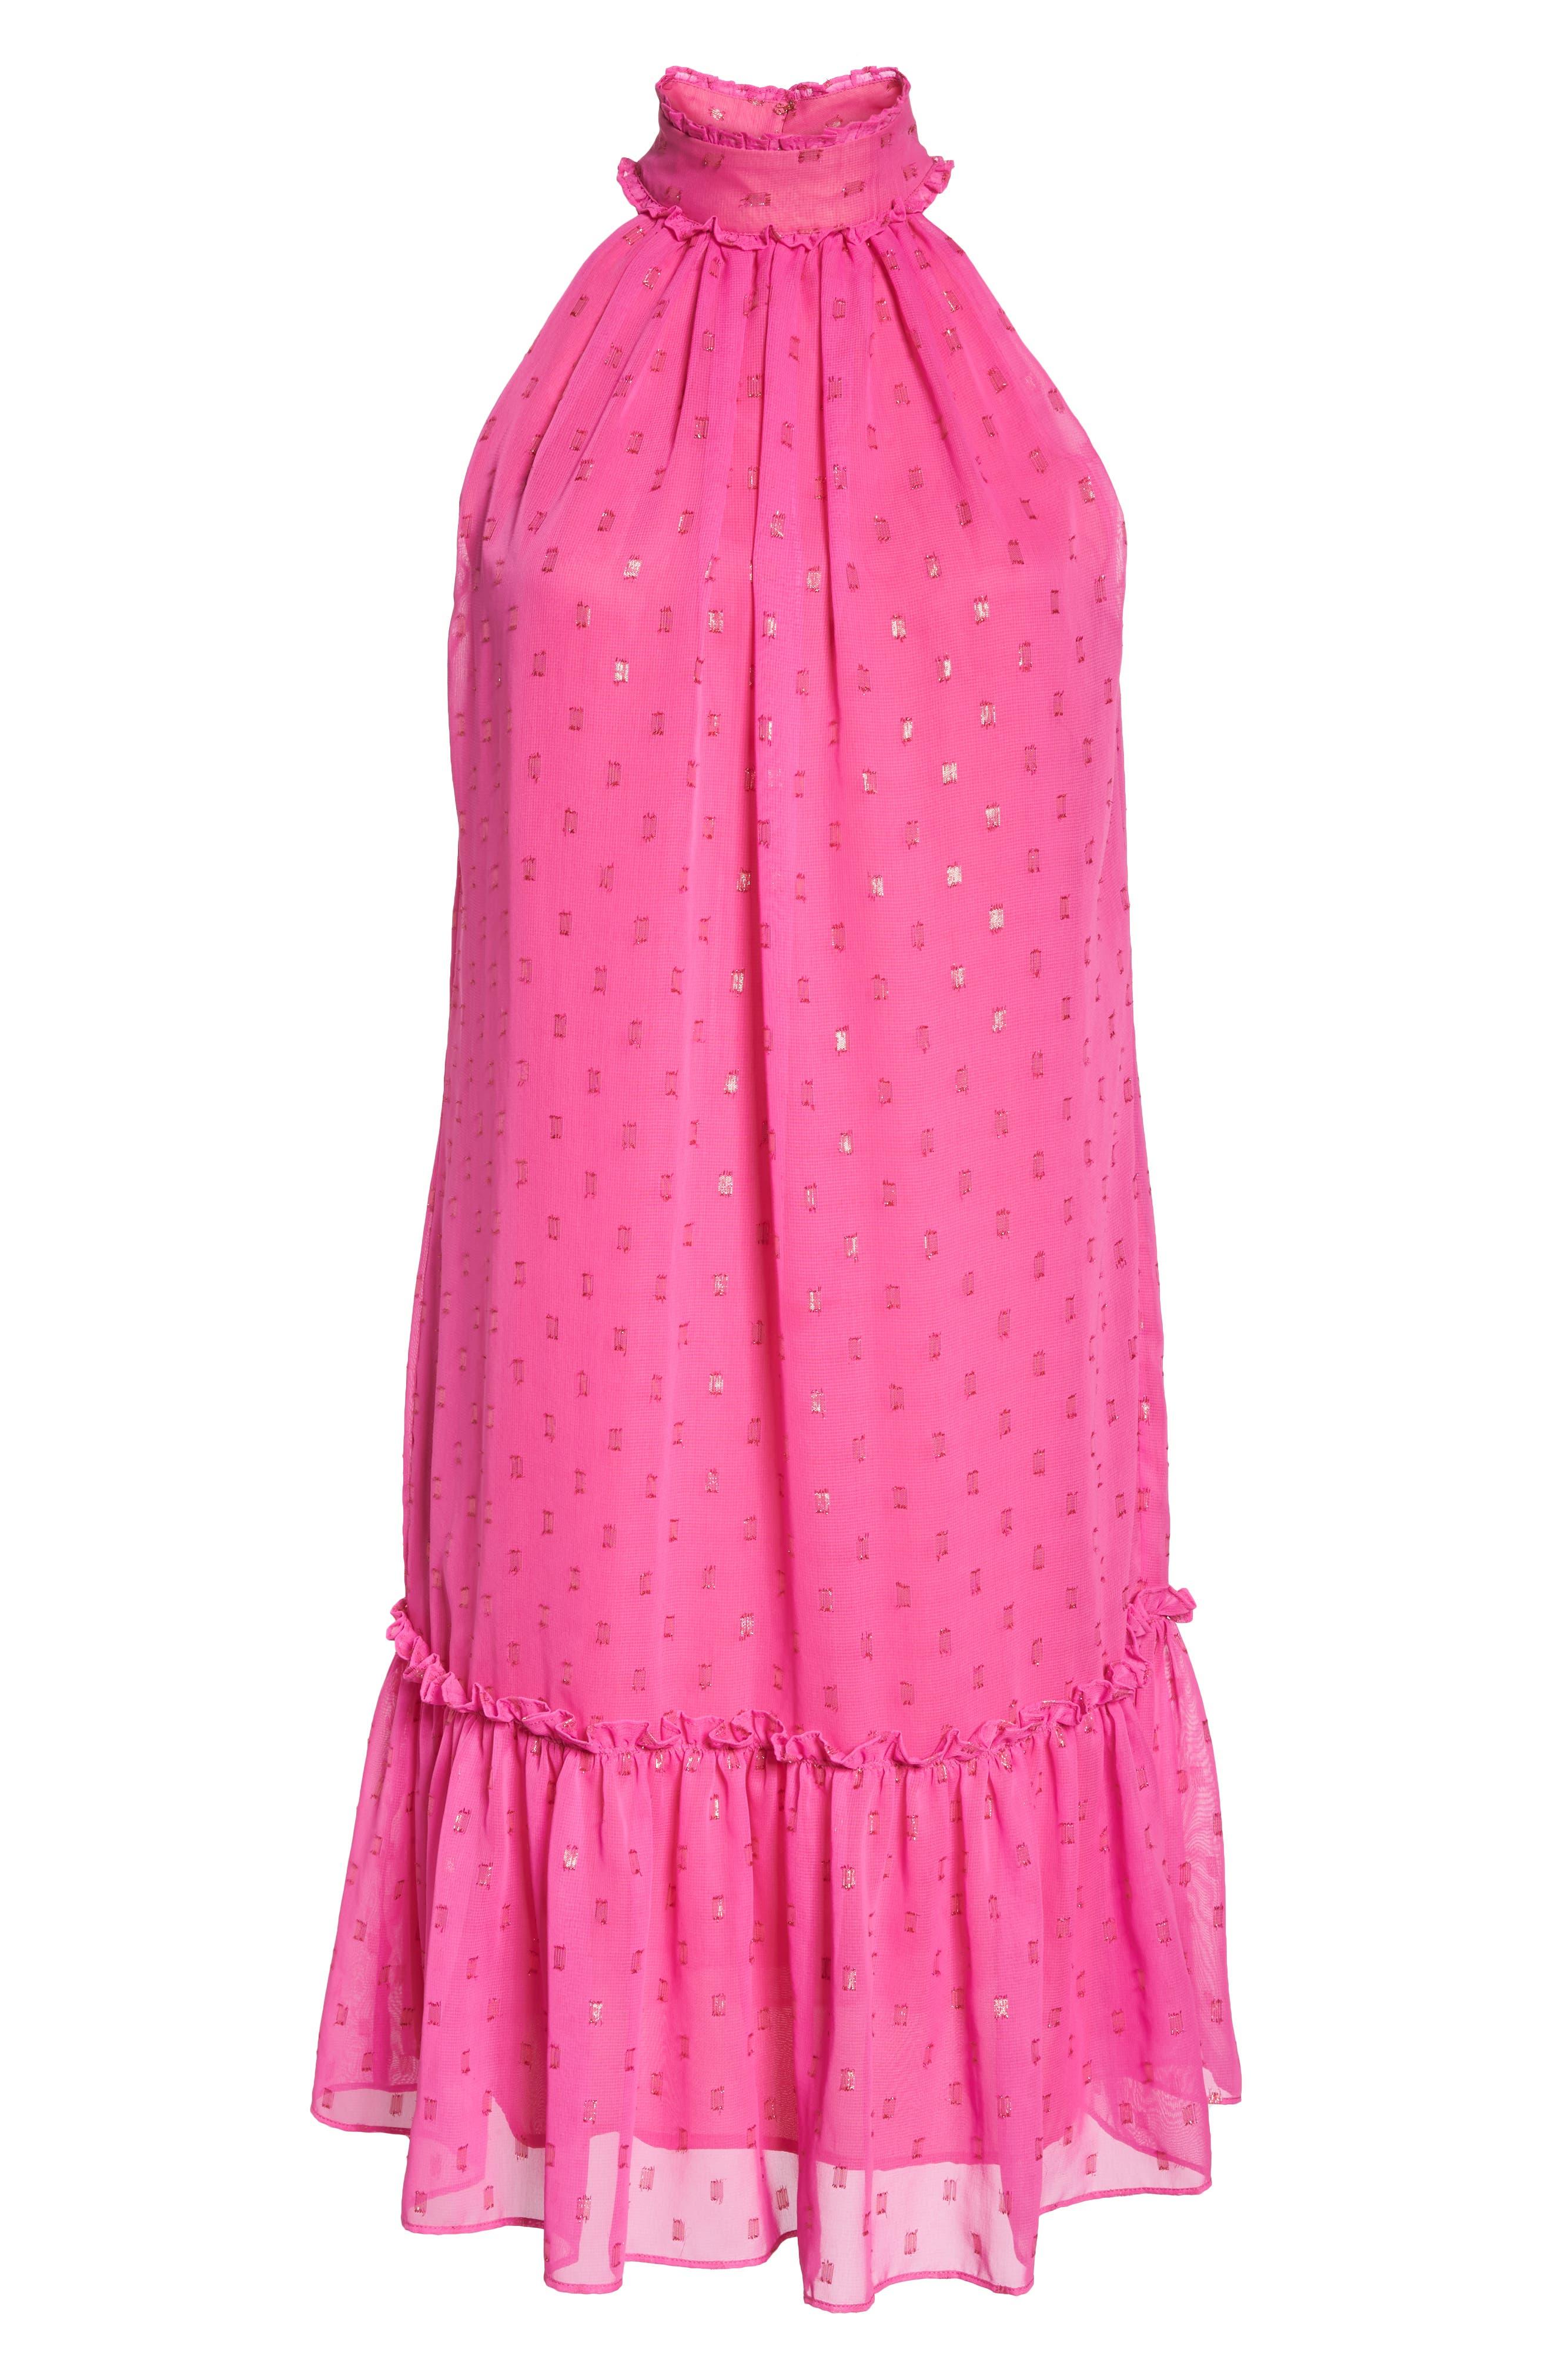 Bodega Bay Chiffon Shift Dress,                             Alternate thumbnail 7, color,                             Brilliant Fuchsia